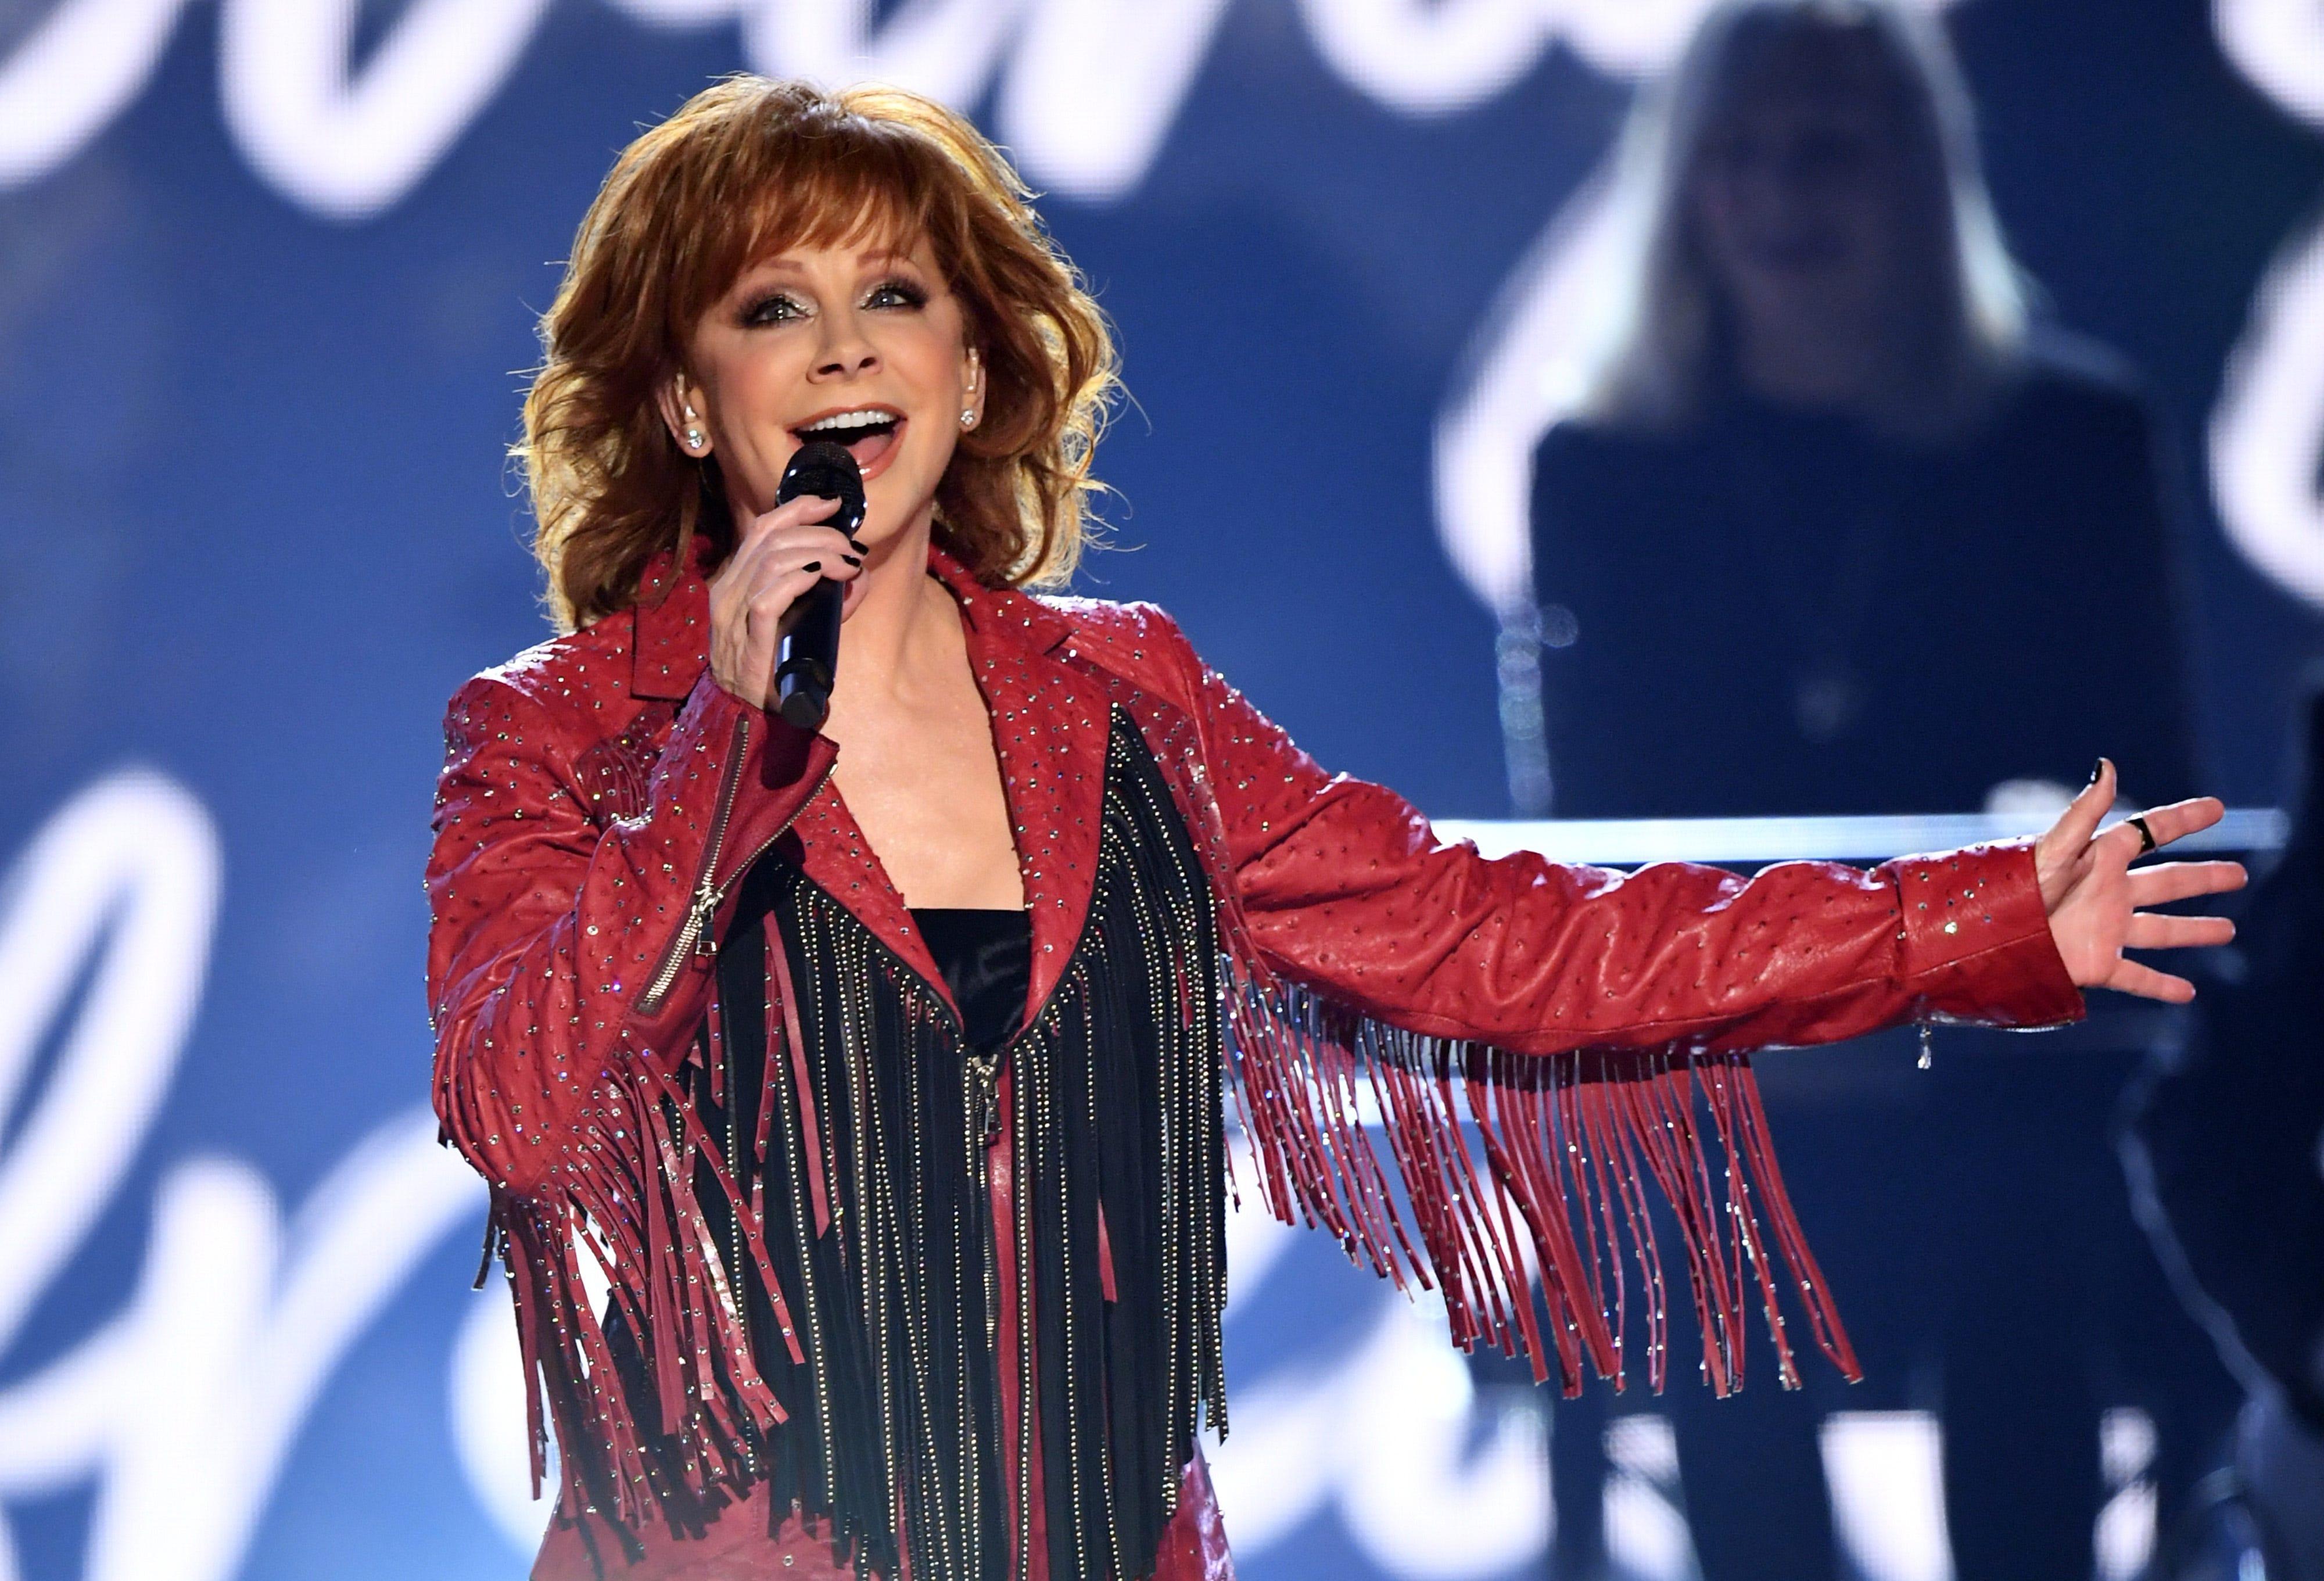 Cher, Reba concerts at Resch rescheduled due to coronavirus; Gaelic Storm, Kathleen Madigan, Bill Engvall postponed